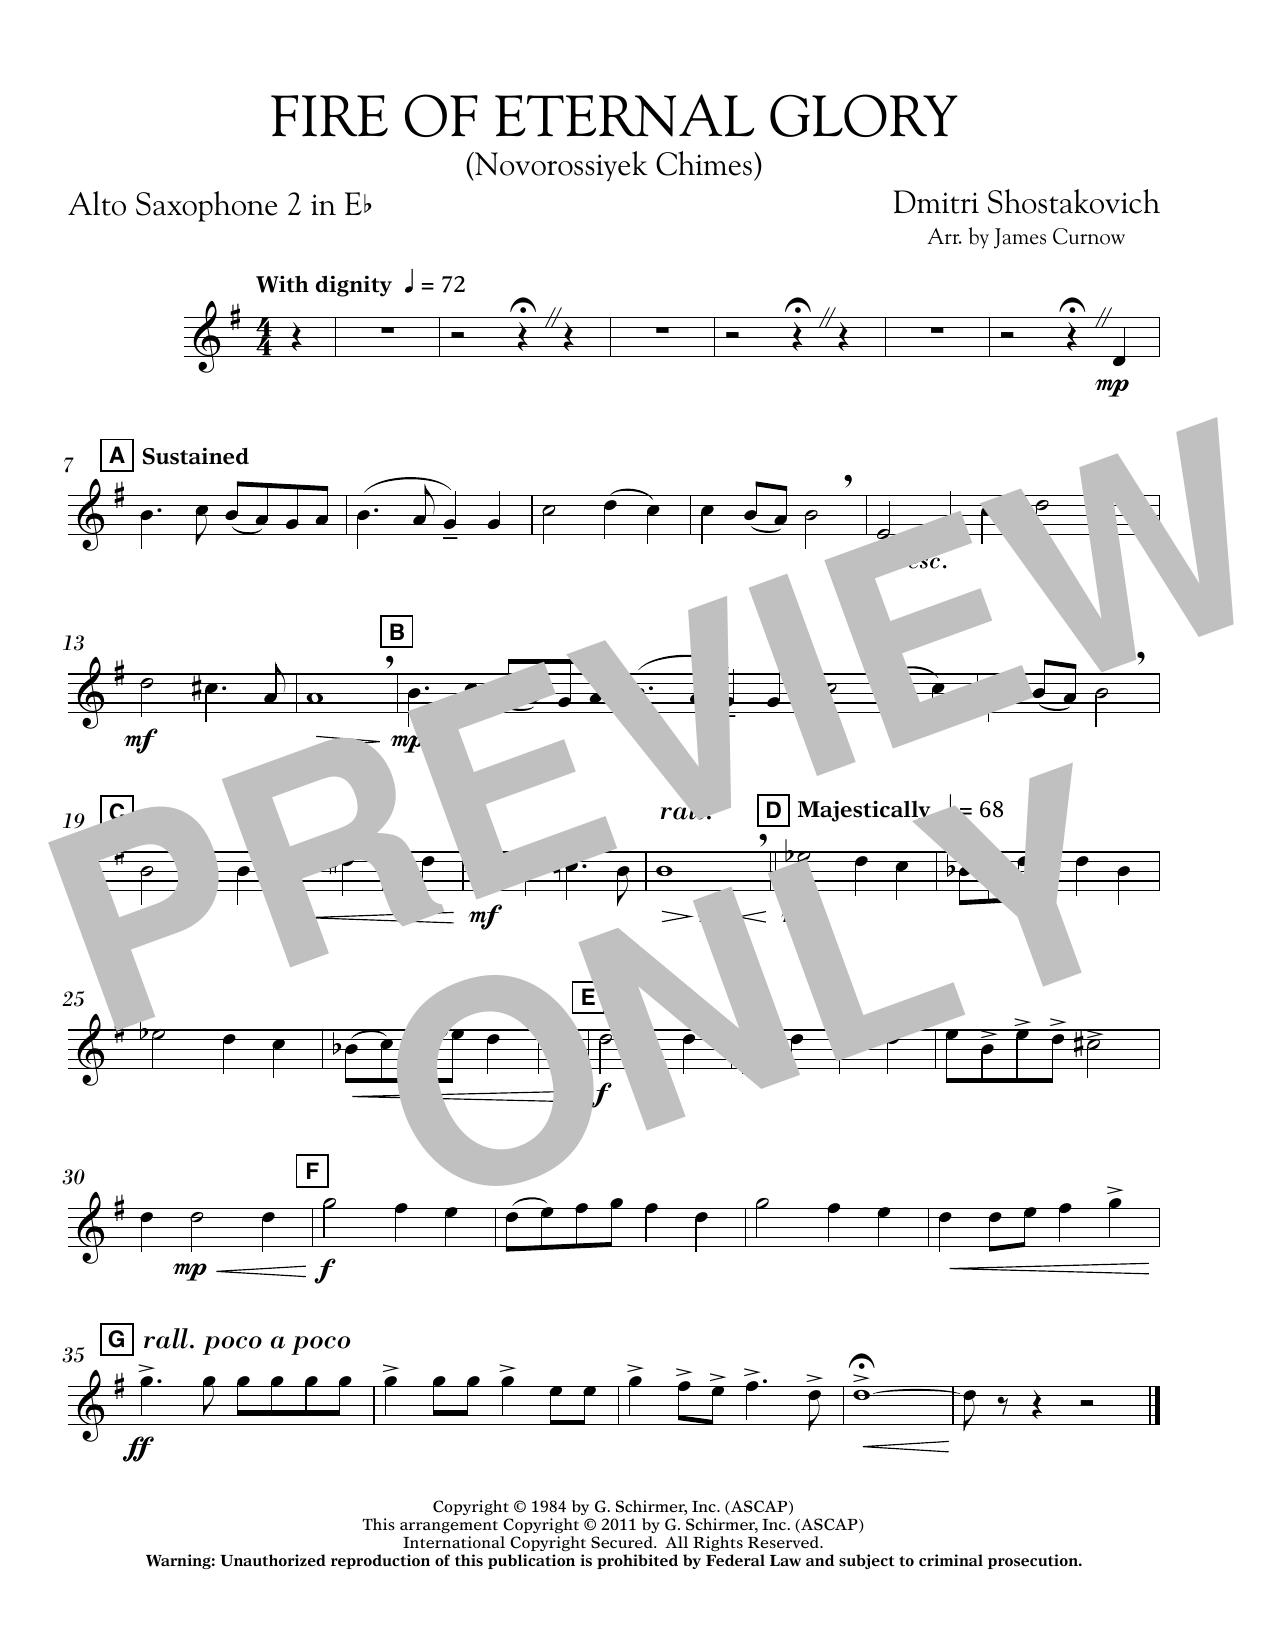 James Curnow Fire of Eternal Glory (Novorossiyek Chimes) - Eb Alto Saxophone 2 sheet music notes printable PDF score